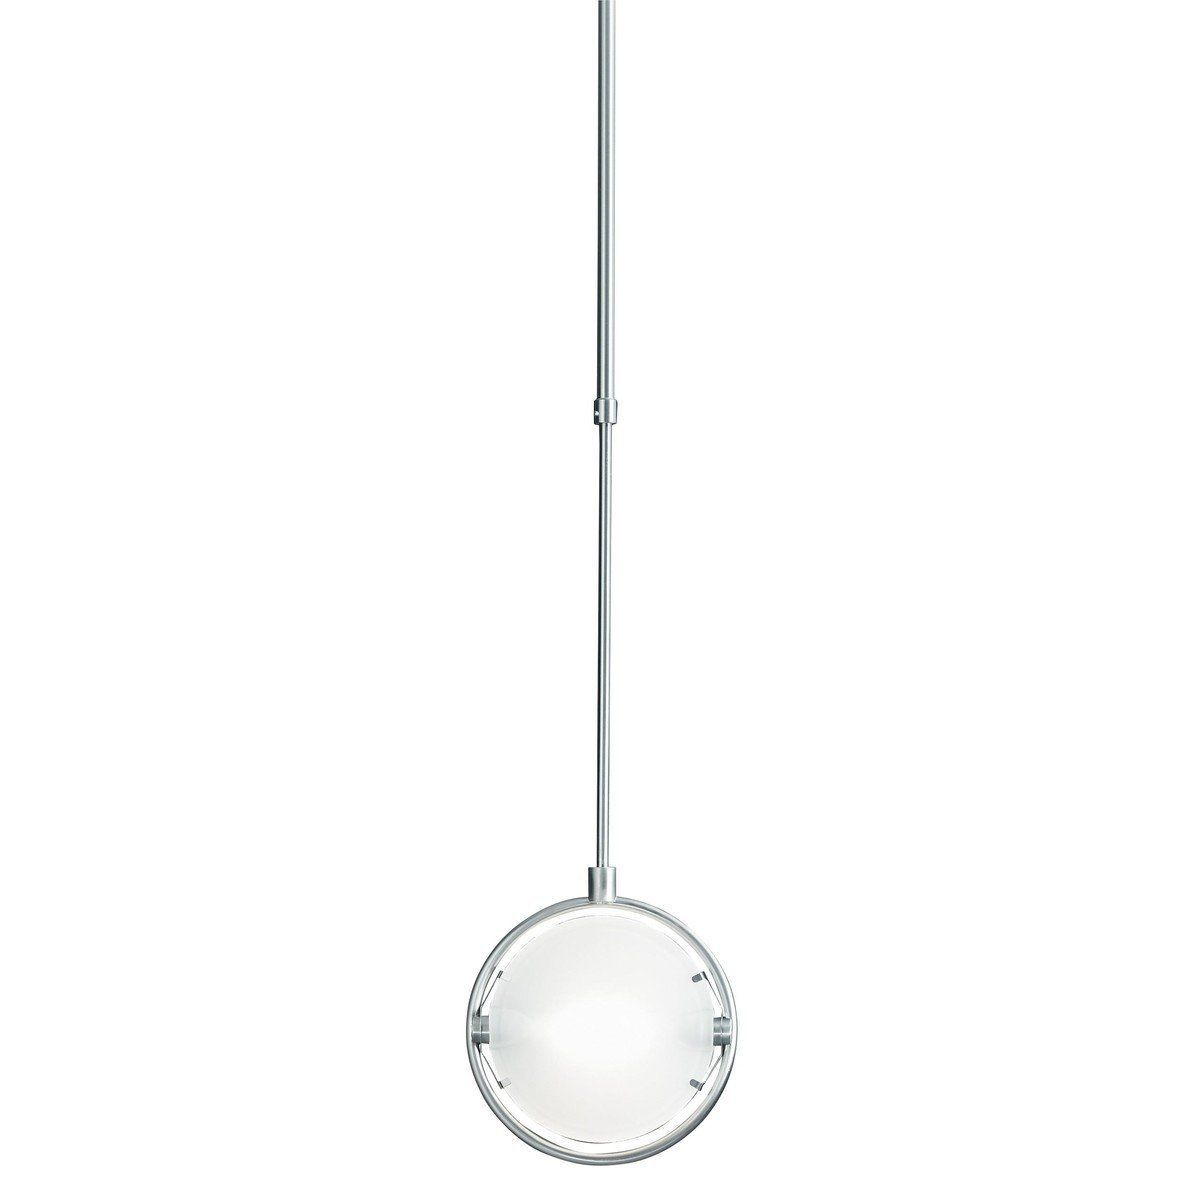 Nobi Suspension Lamp   Fontana Arte   AmbienteDirect.com